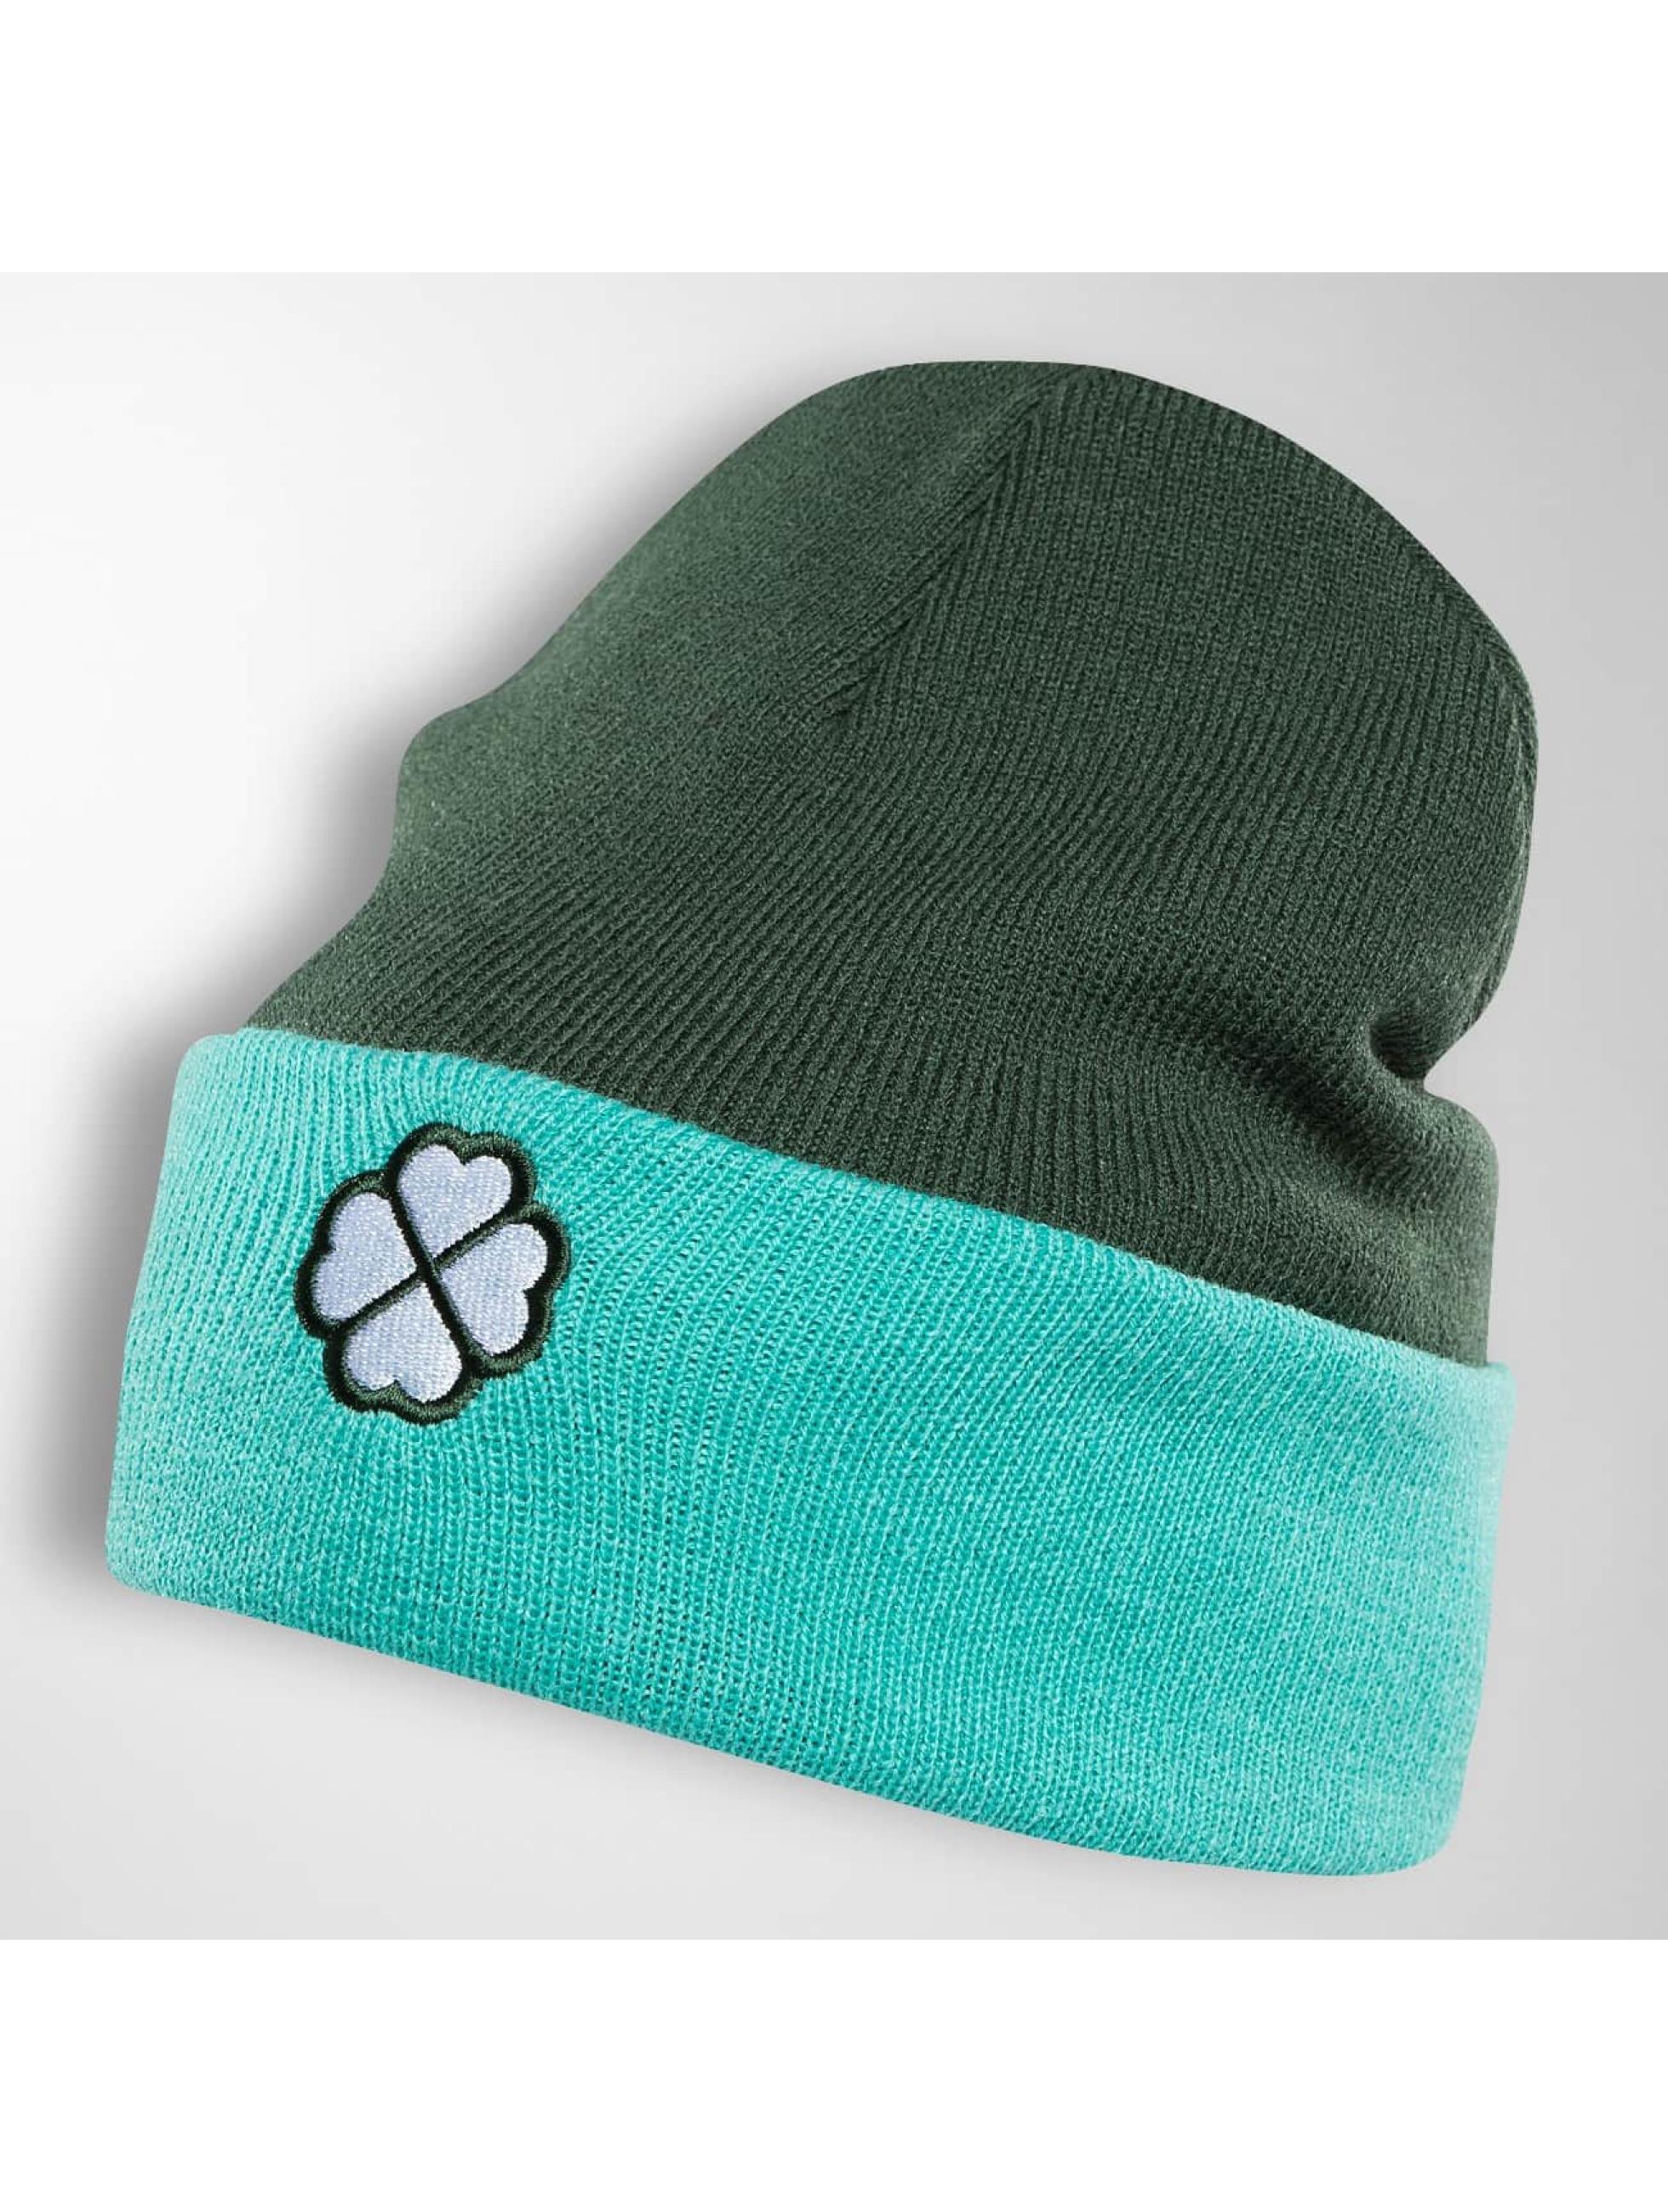 TrueSpin Hat-1 Klee green